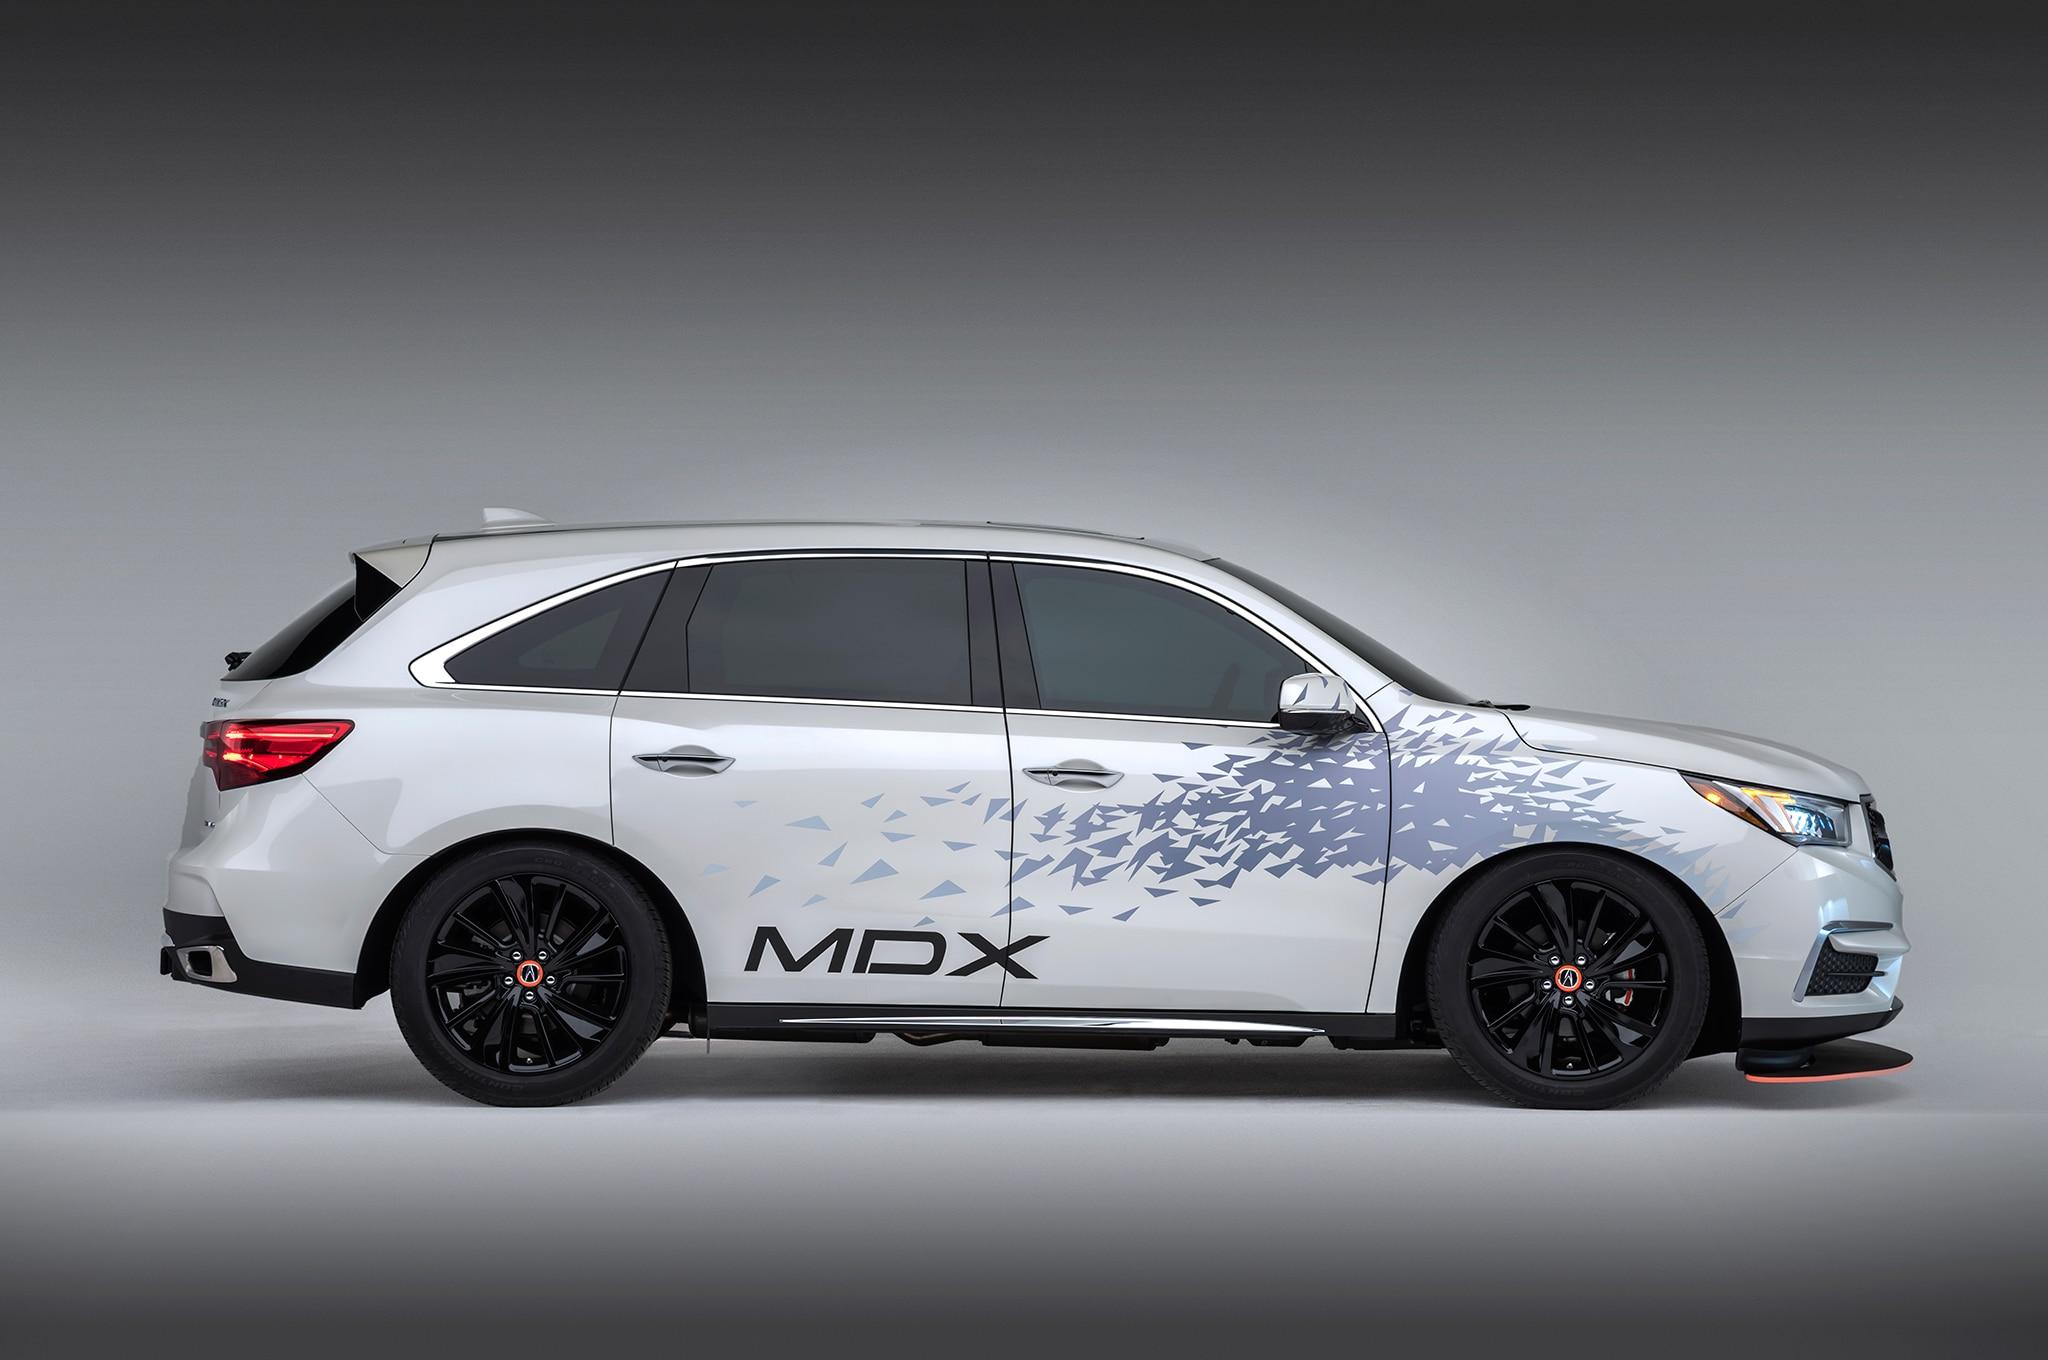 2017 Acura MDX SEMA side